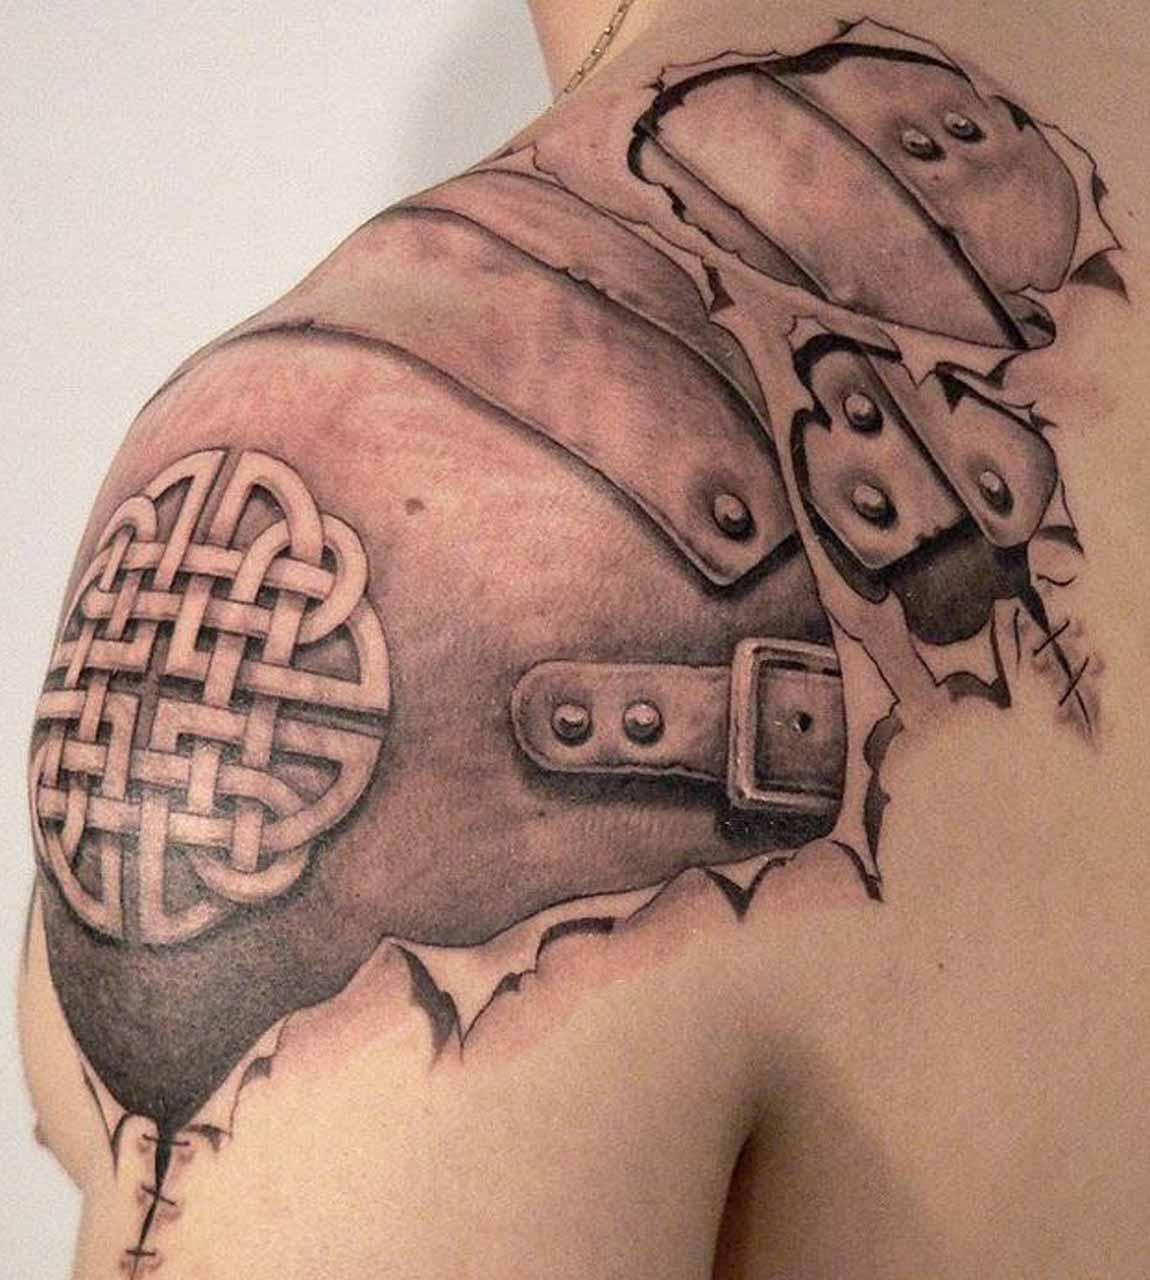 Tumblr tattoo tattoos for men shoulder designs for Design tattoo tumblr